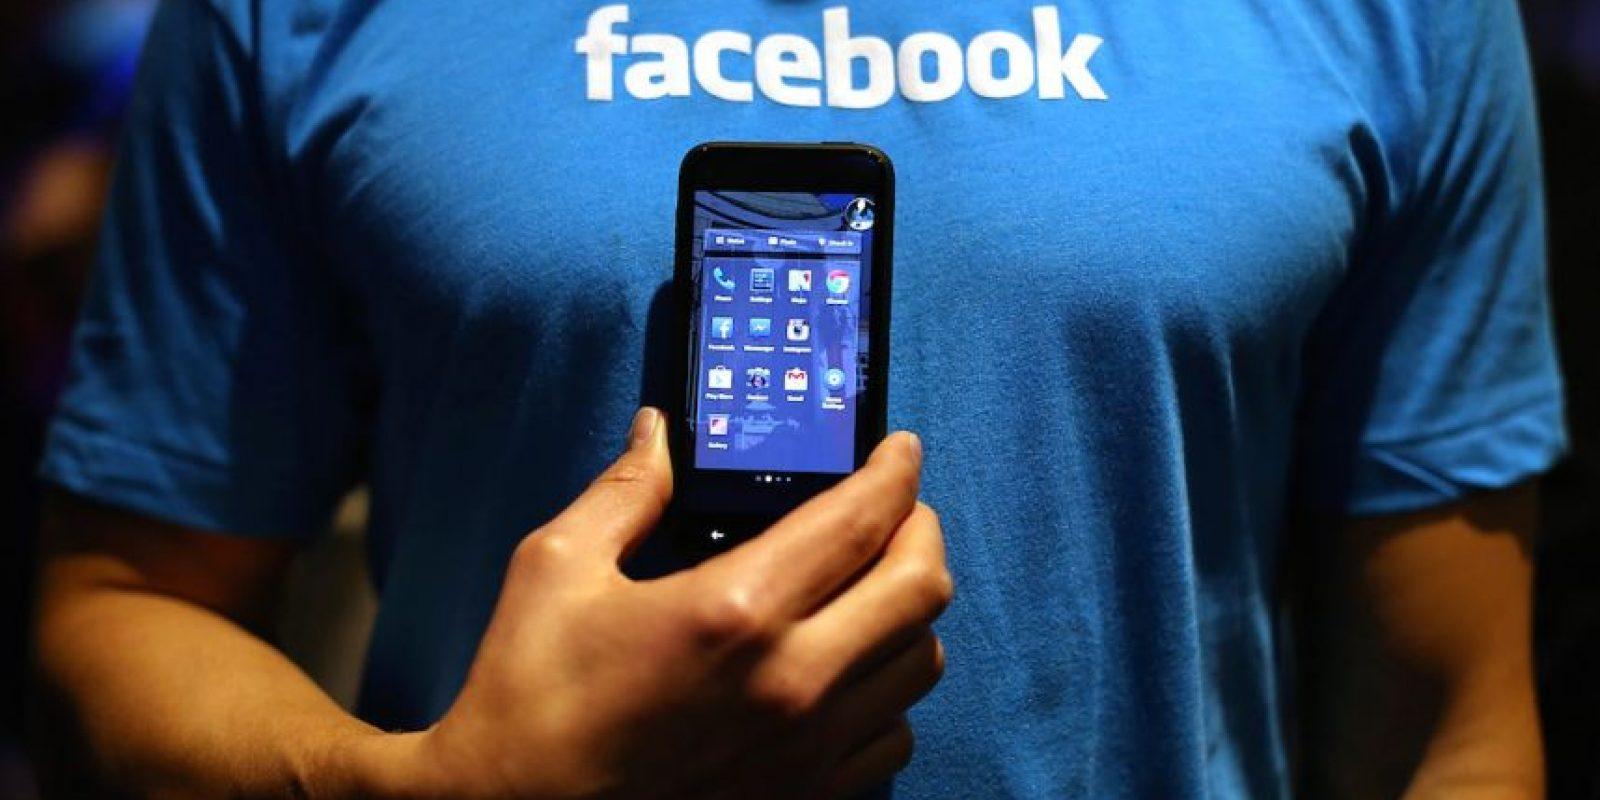 El Internet gratis de Facebook causa polémica. Foto:Getty Images